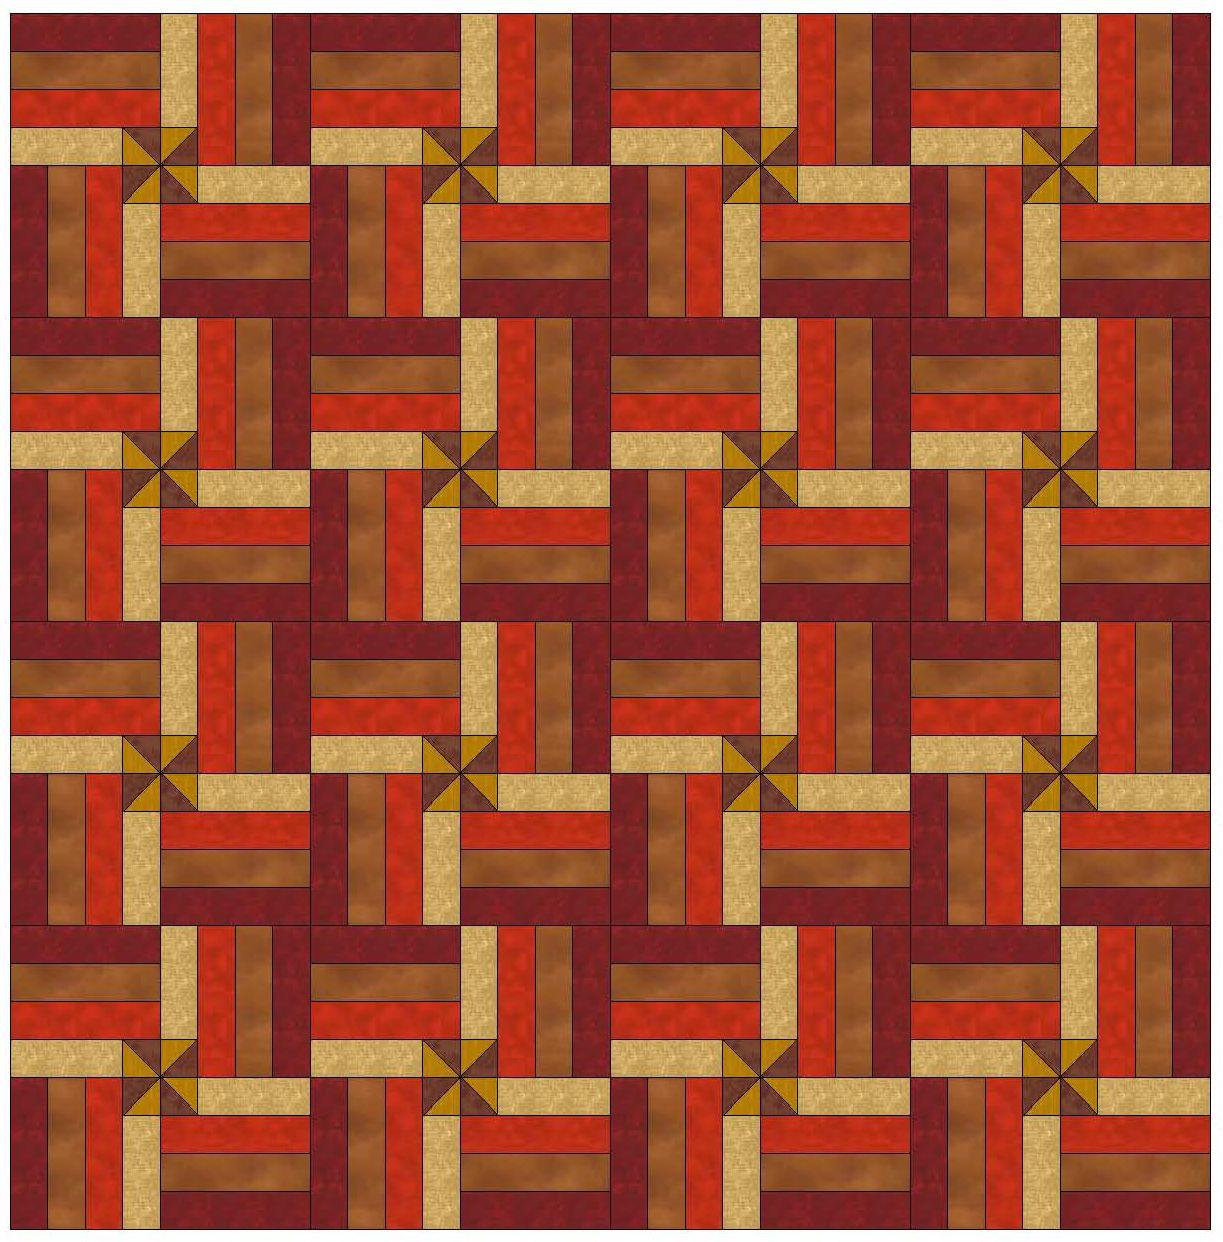 Rail Fence Quilt Variations | Pdf Quilt Pattern Baby Blocks Hree ... : rail fence quilt block - Adamdwight.com